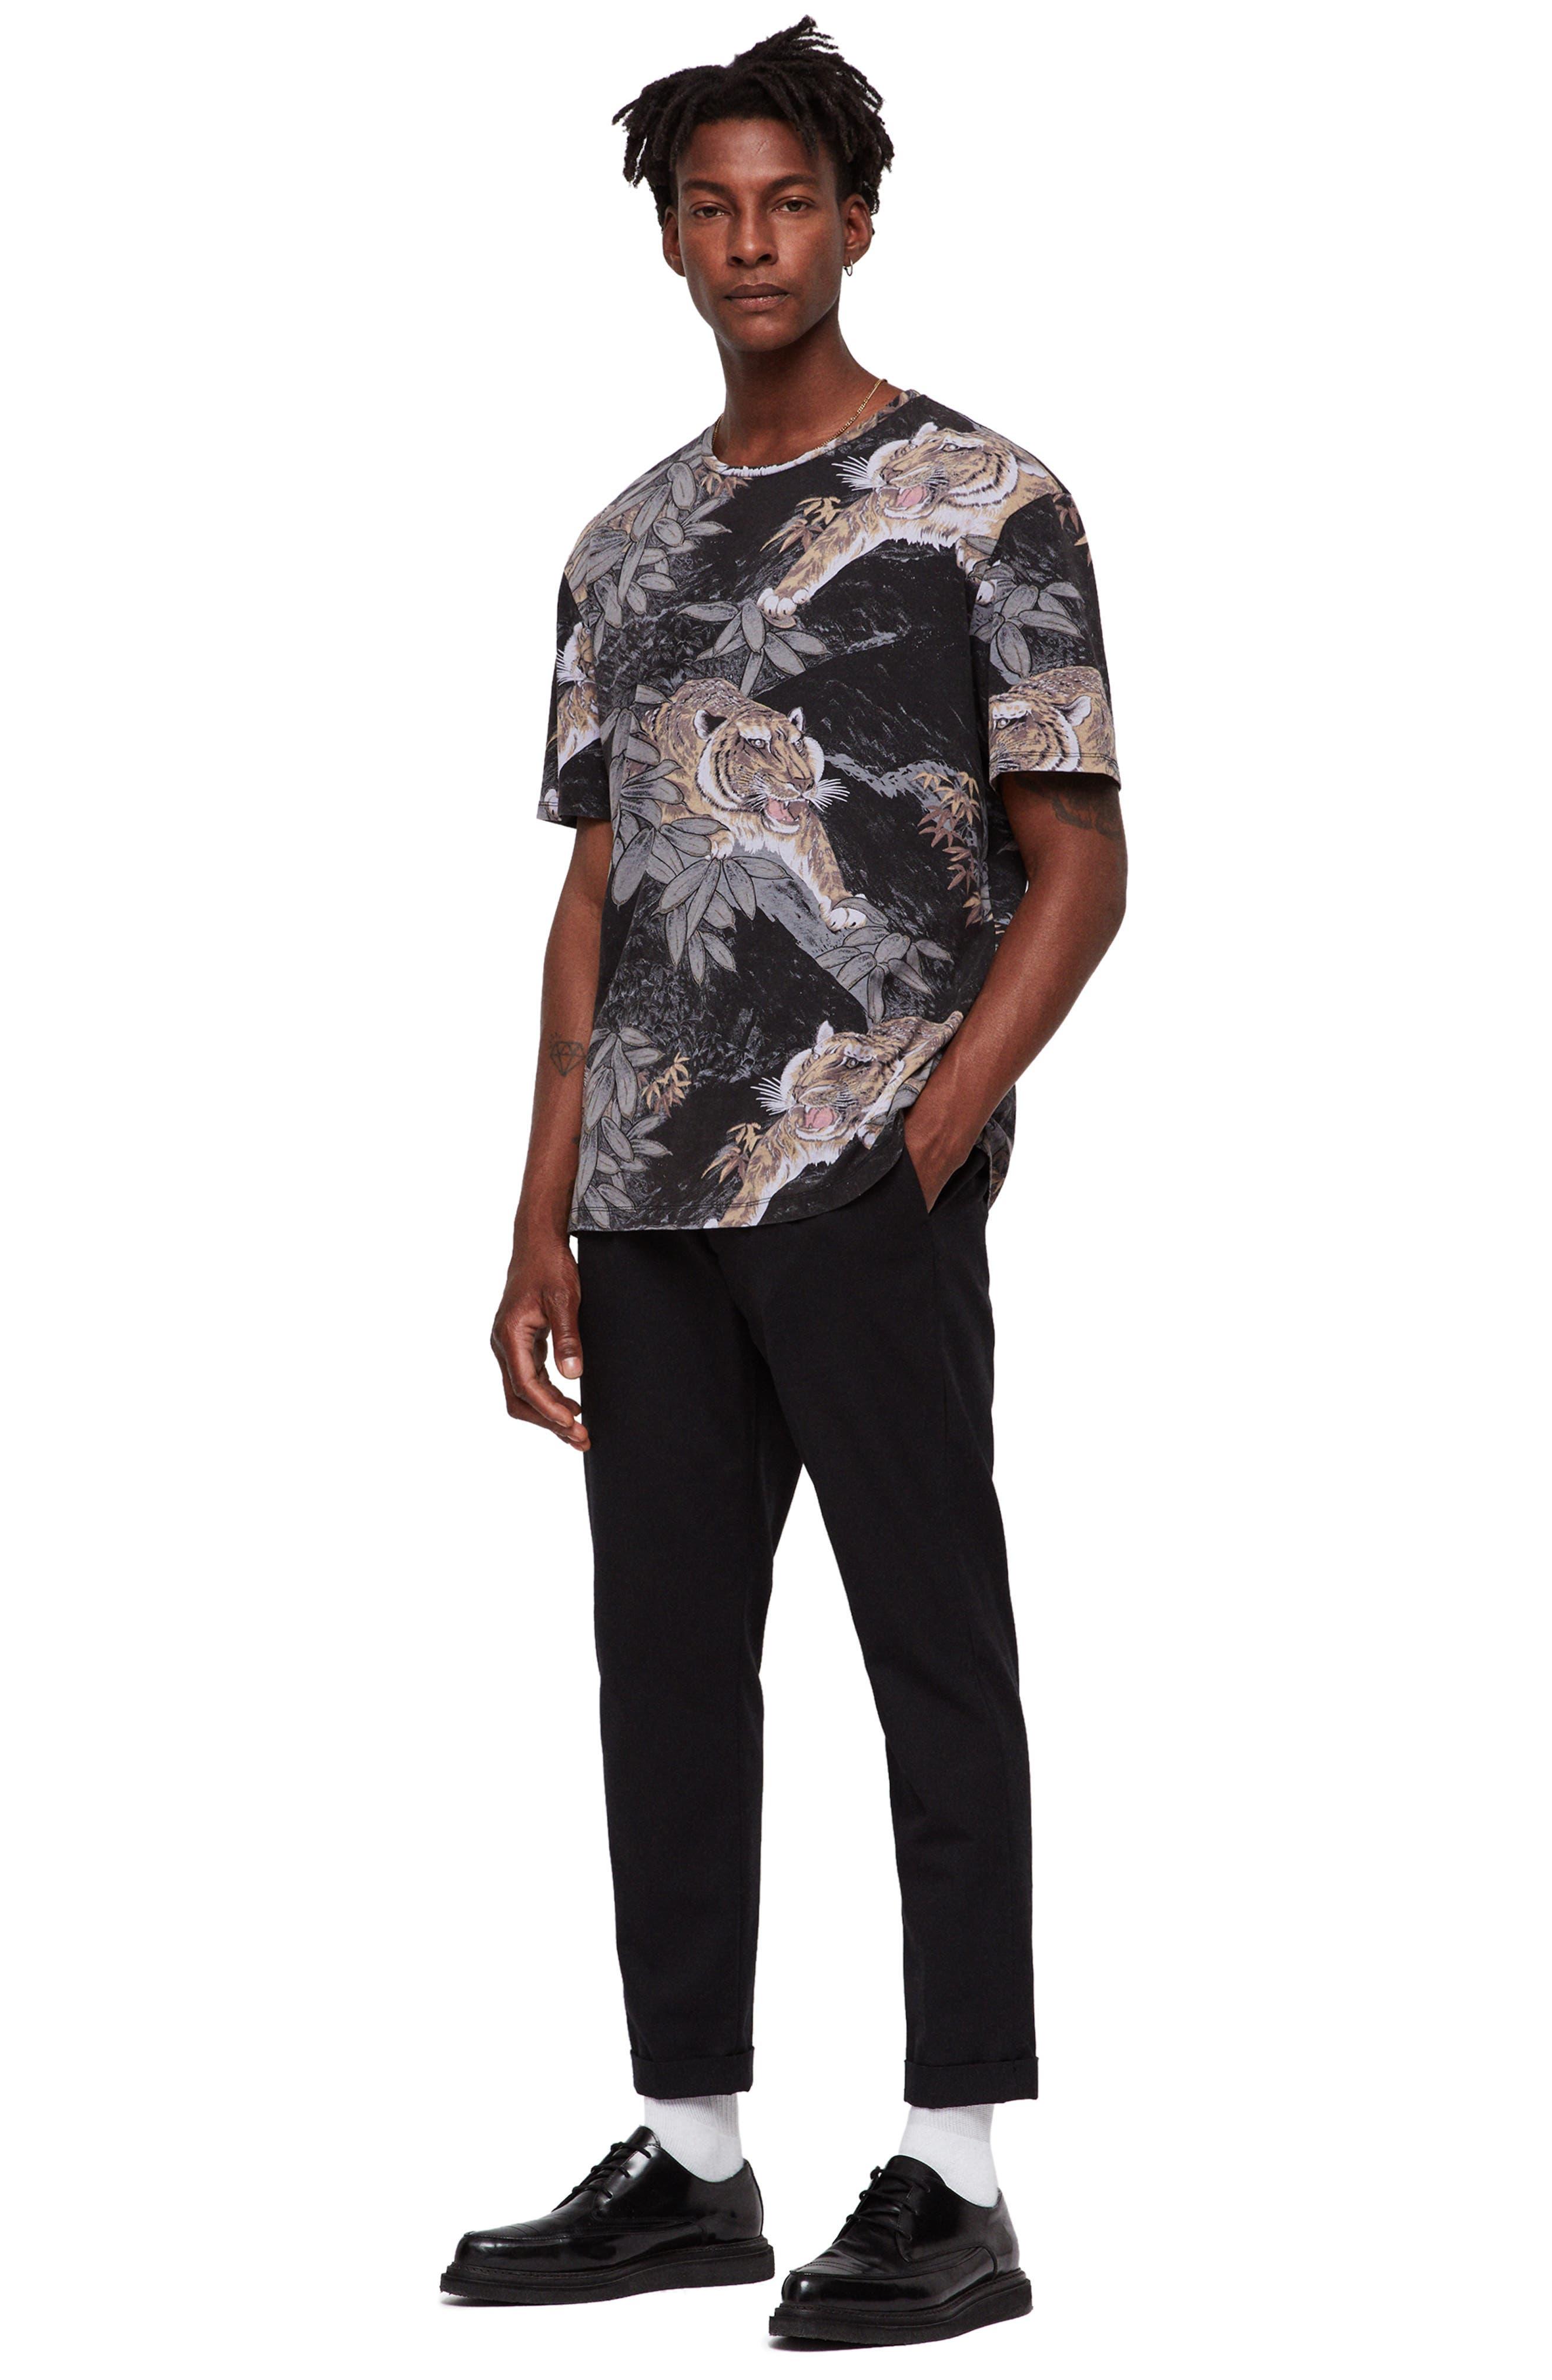 Chokai Slim Fit T-Shirt,                             Alternate thumbnail 7, color,                             004